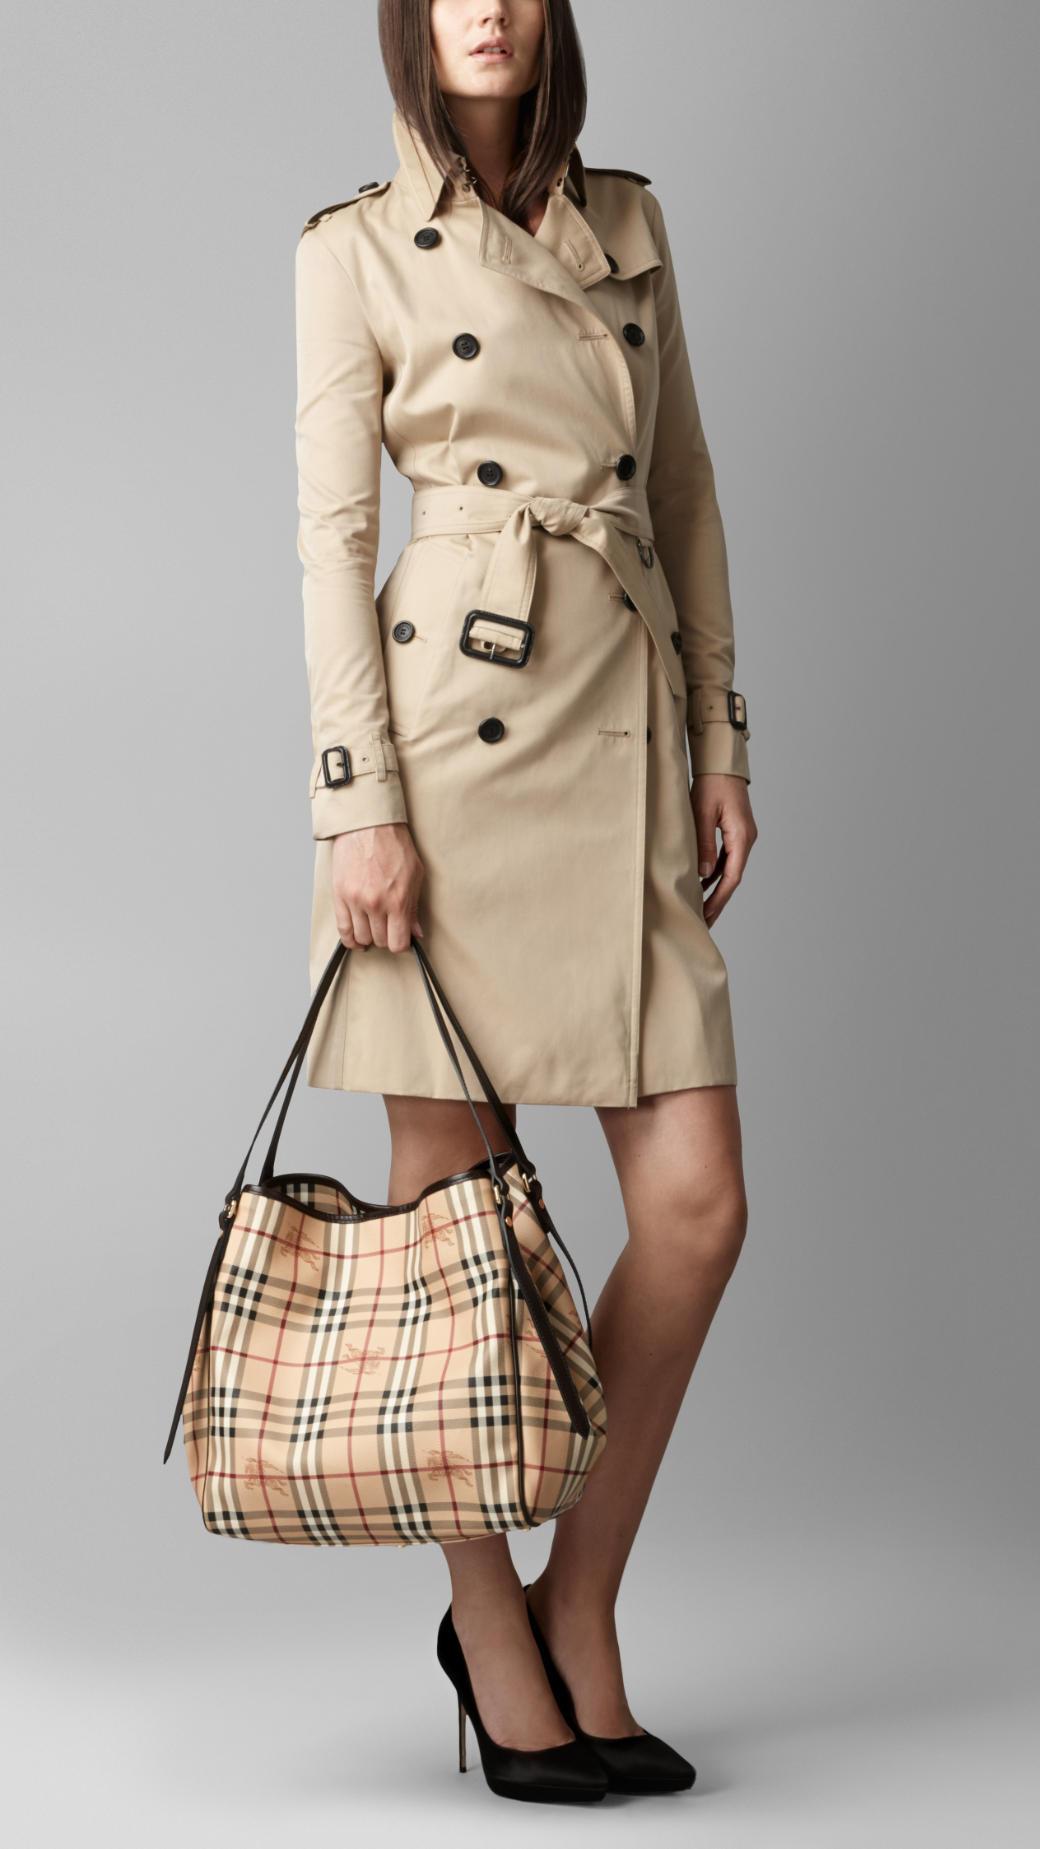 030c20c17f84 Lyst - Burberry Medium Haymarket Check Tote Bag in Brown